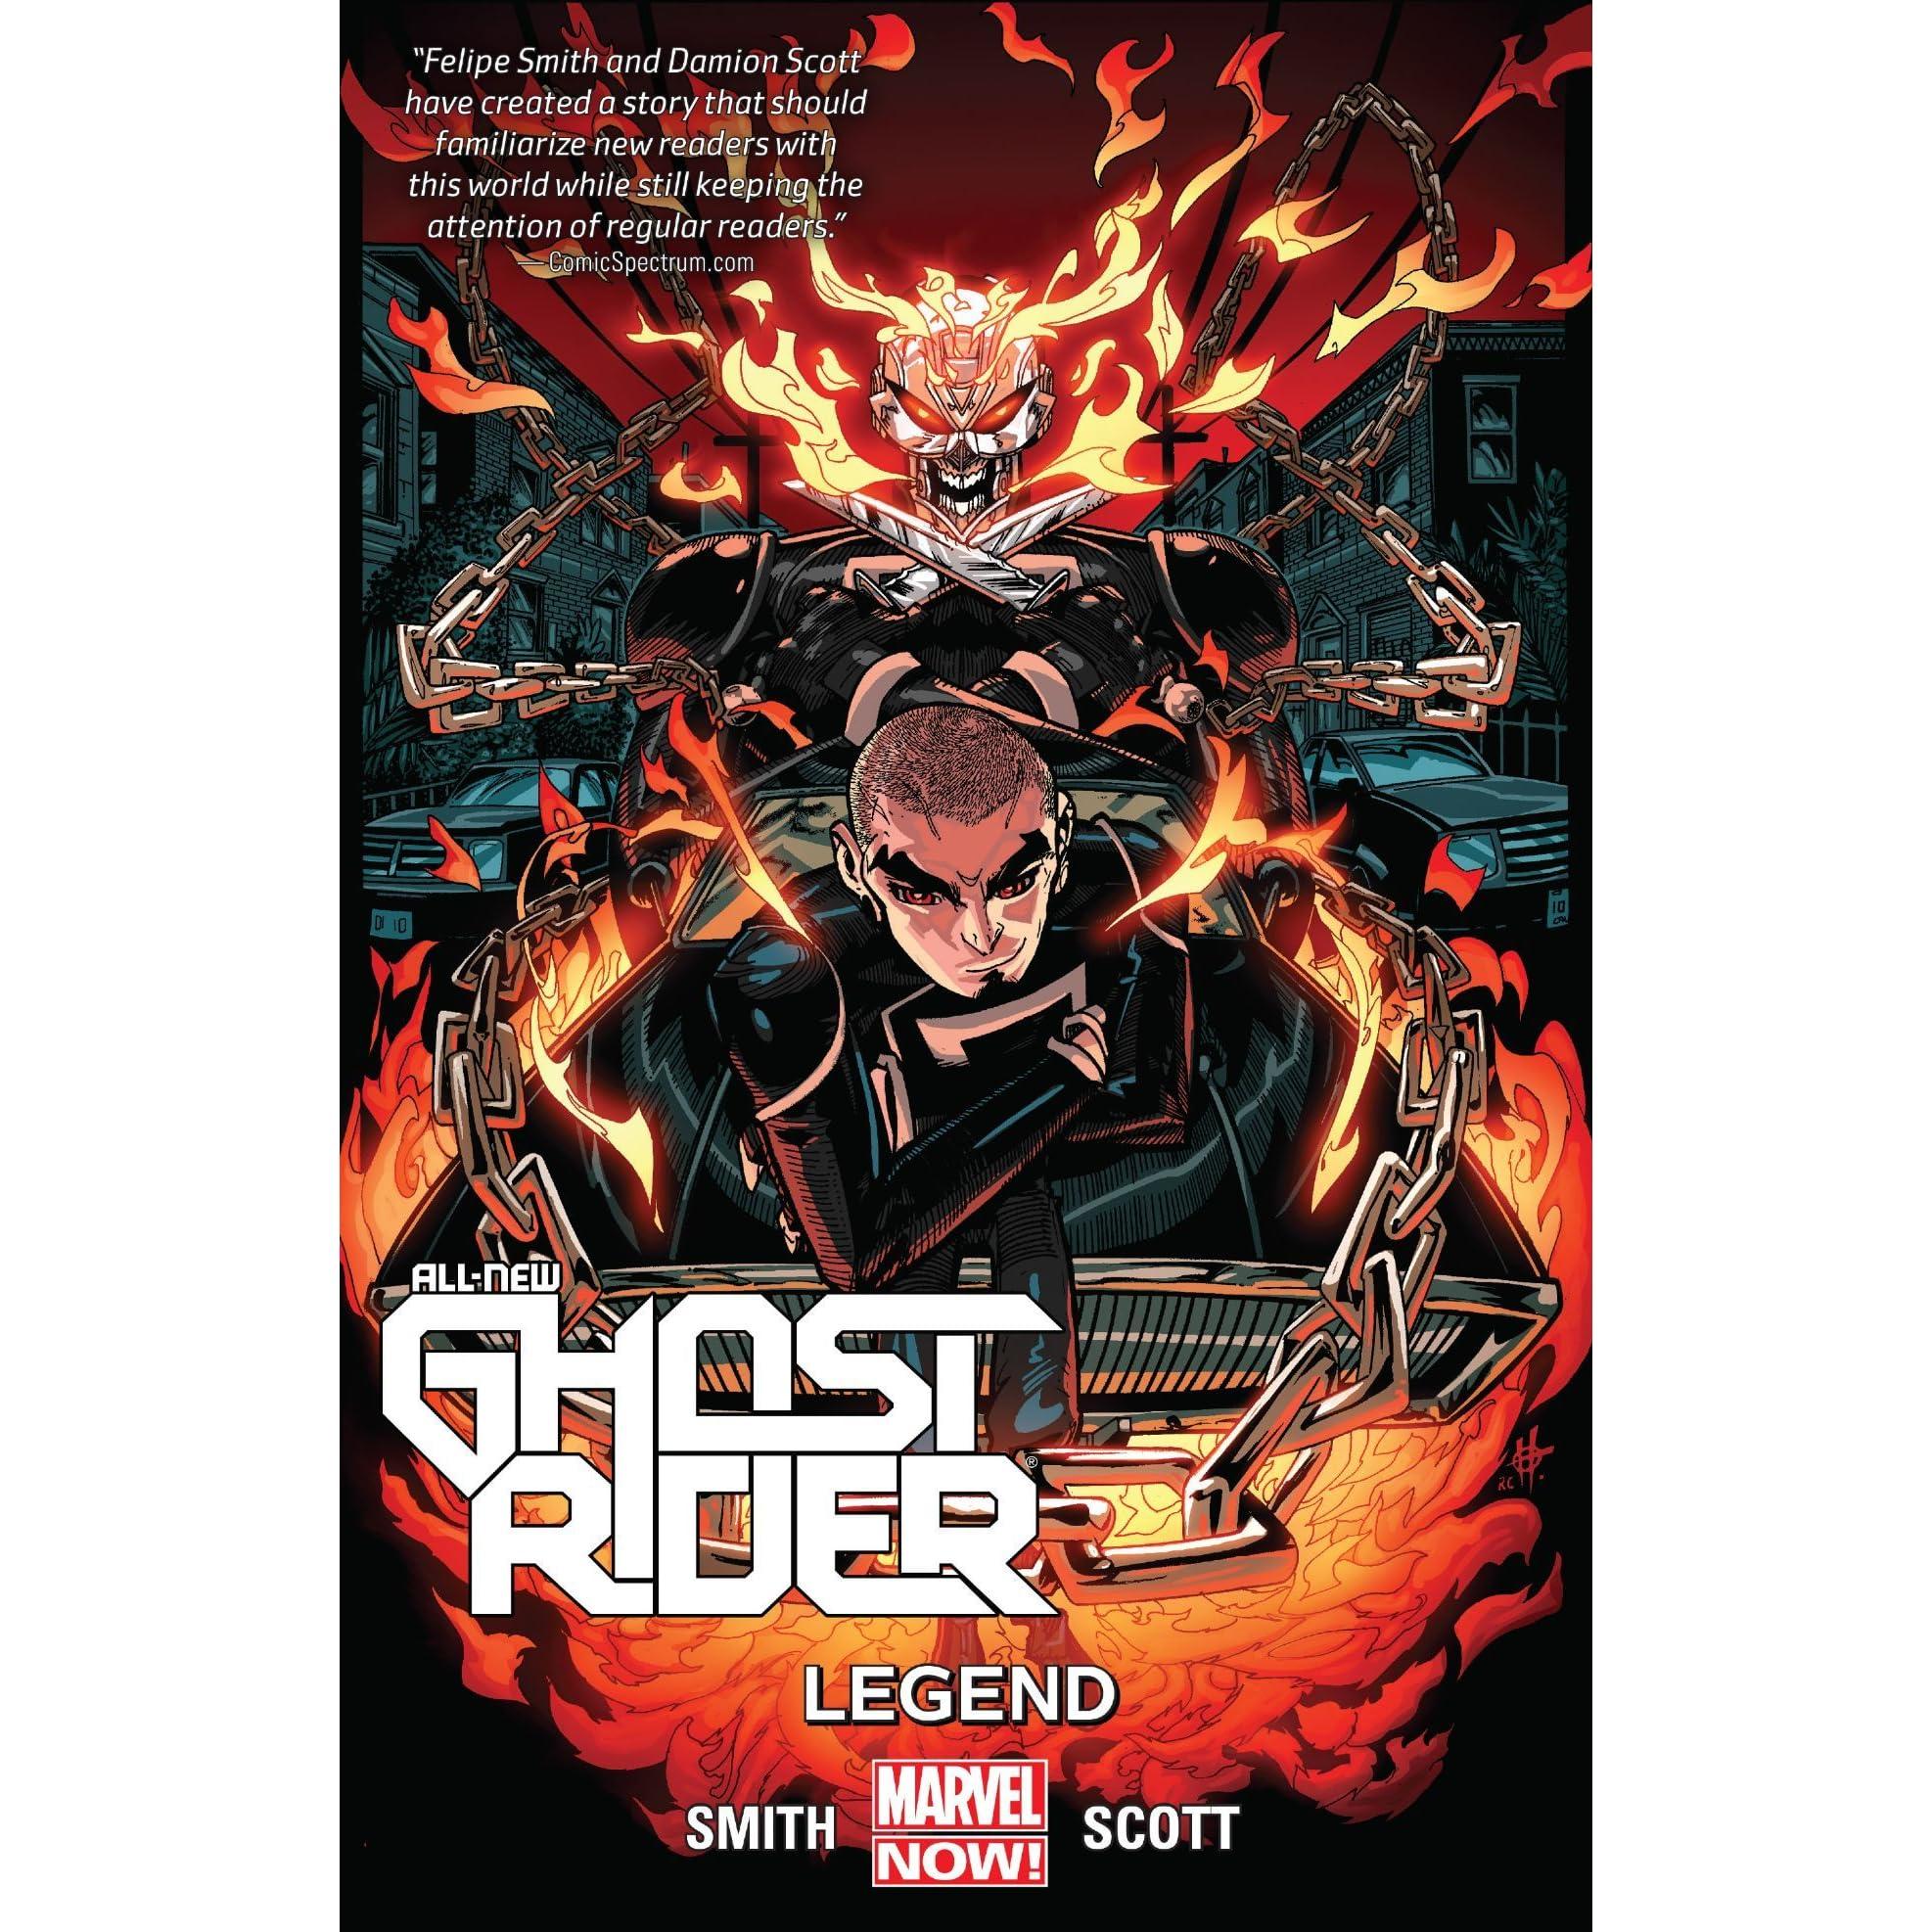 All-New Ghost Rider, Vol  2: Legend by Felipe Smith